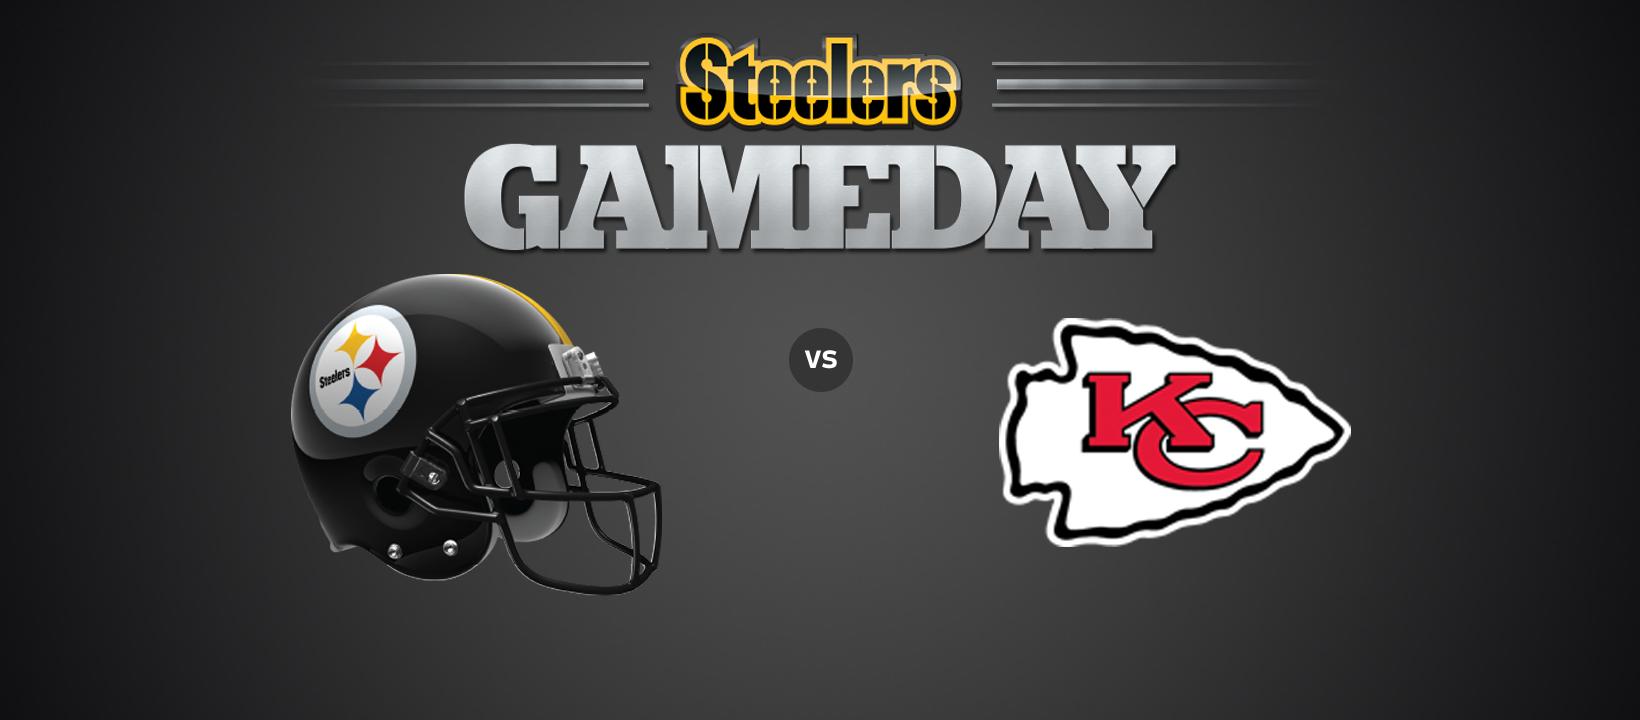 2018 Steelers vs. Chiefs